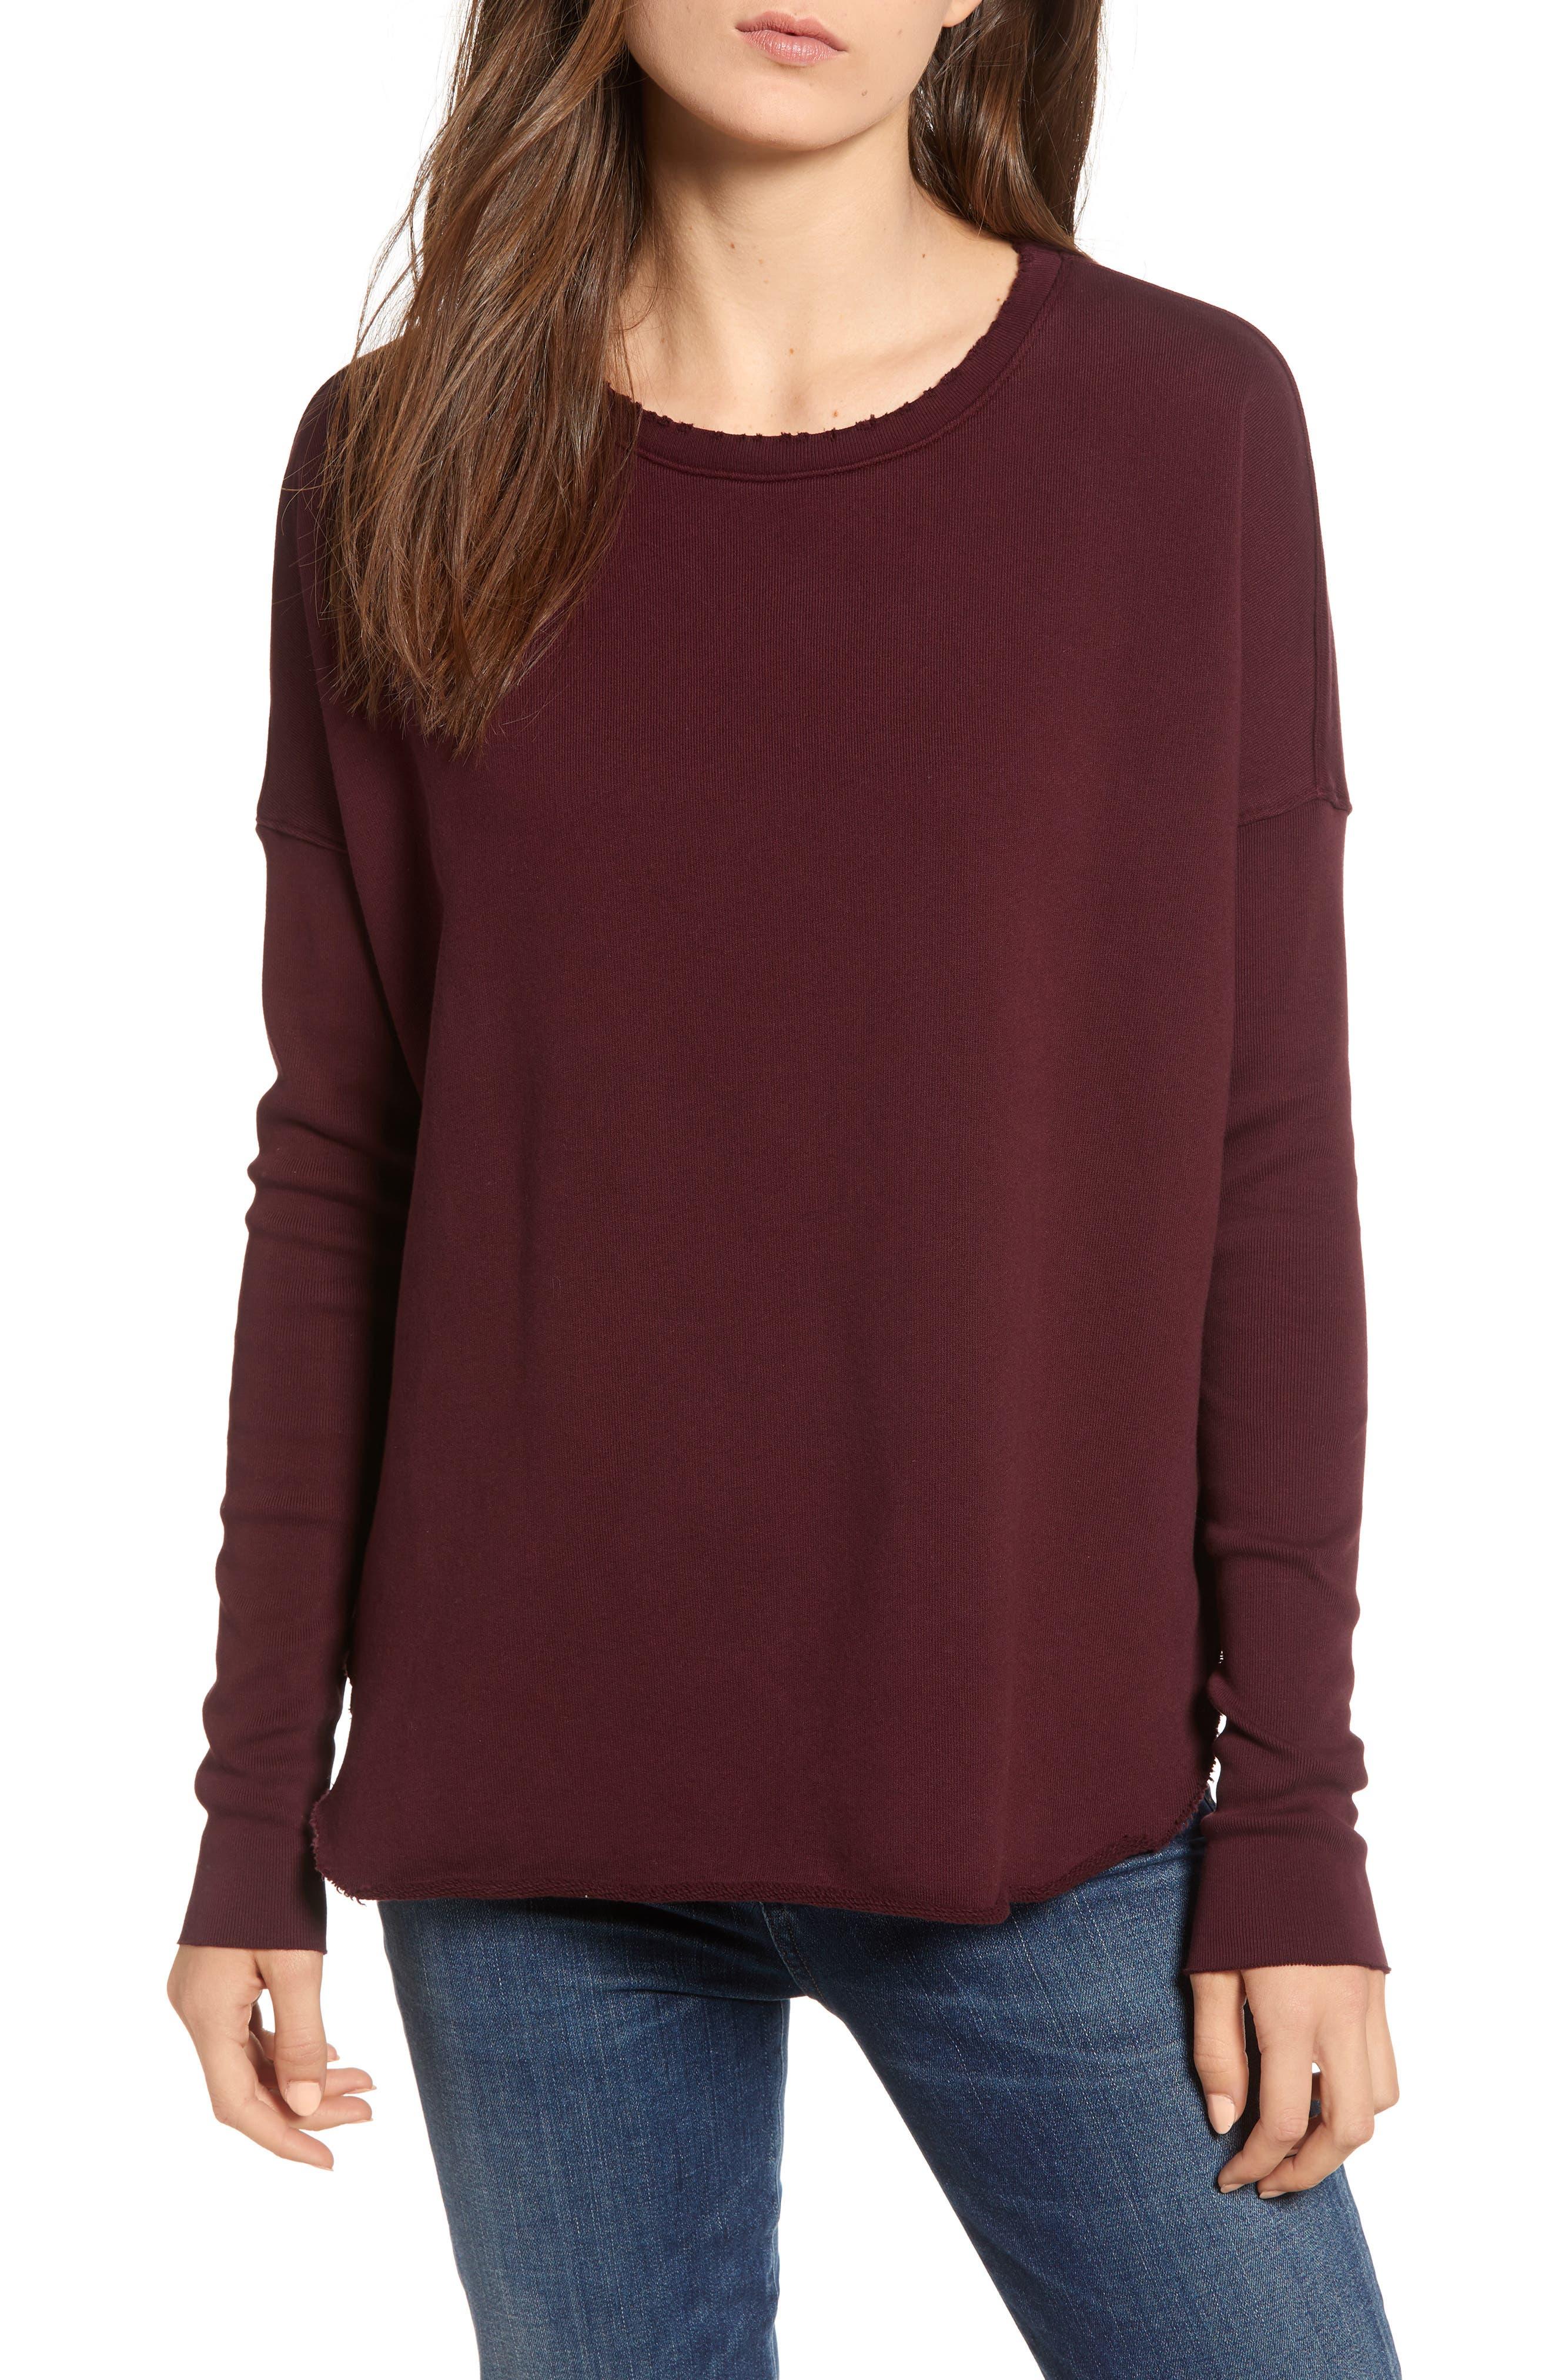 FRANK & EILEEN TEE LAB Long-Sleeve High-Low Cotton Fleece Sweatshirt in Vamp